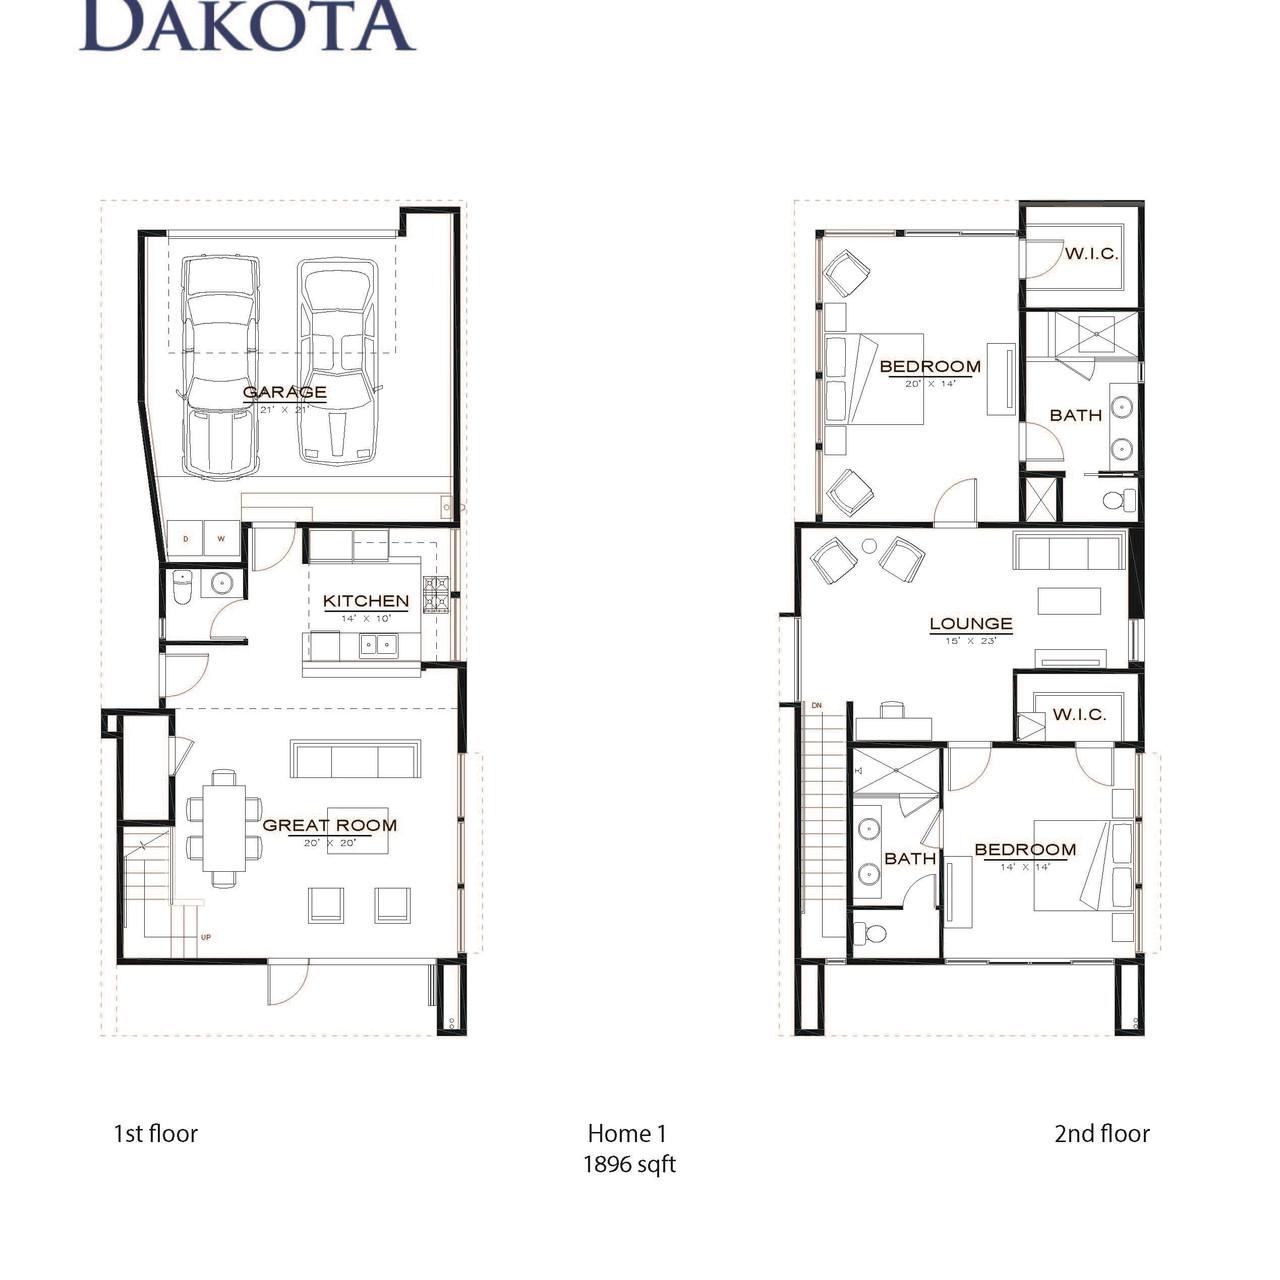 Dakota-Phase2-FloorPlans-Home 1_Page_1